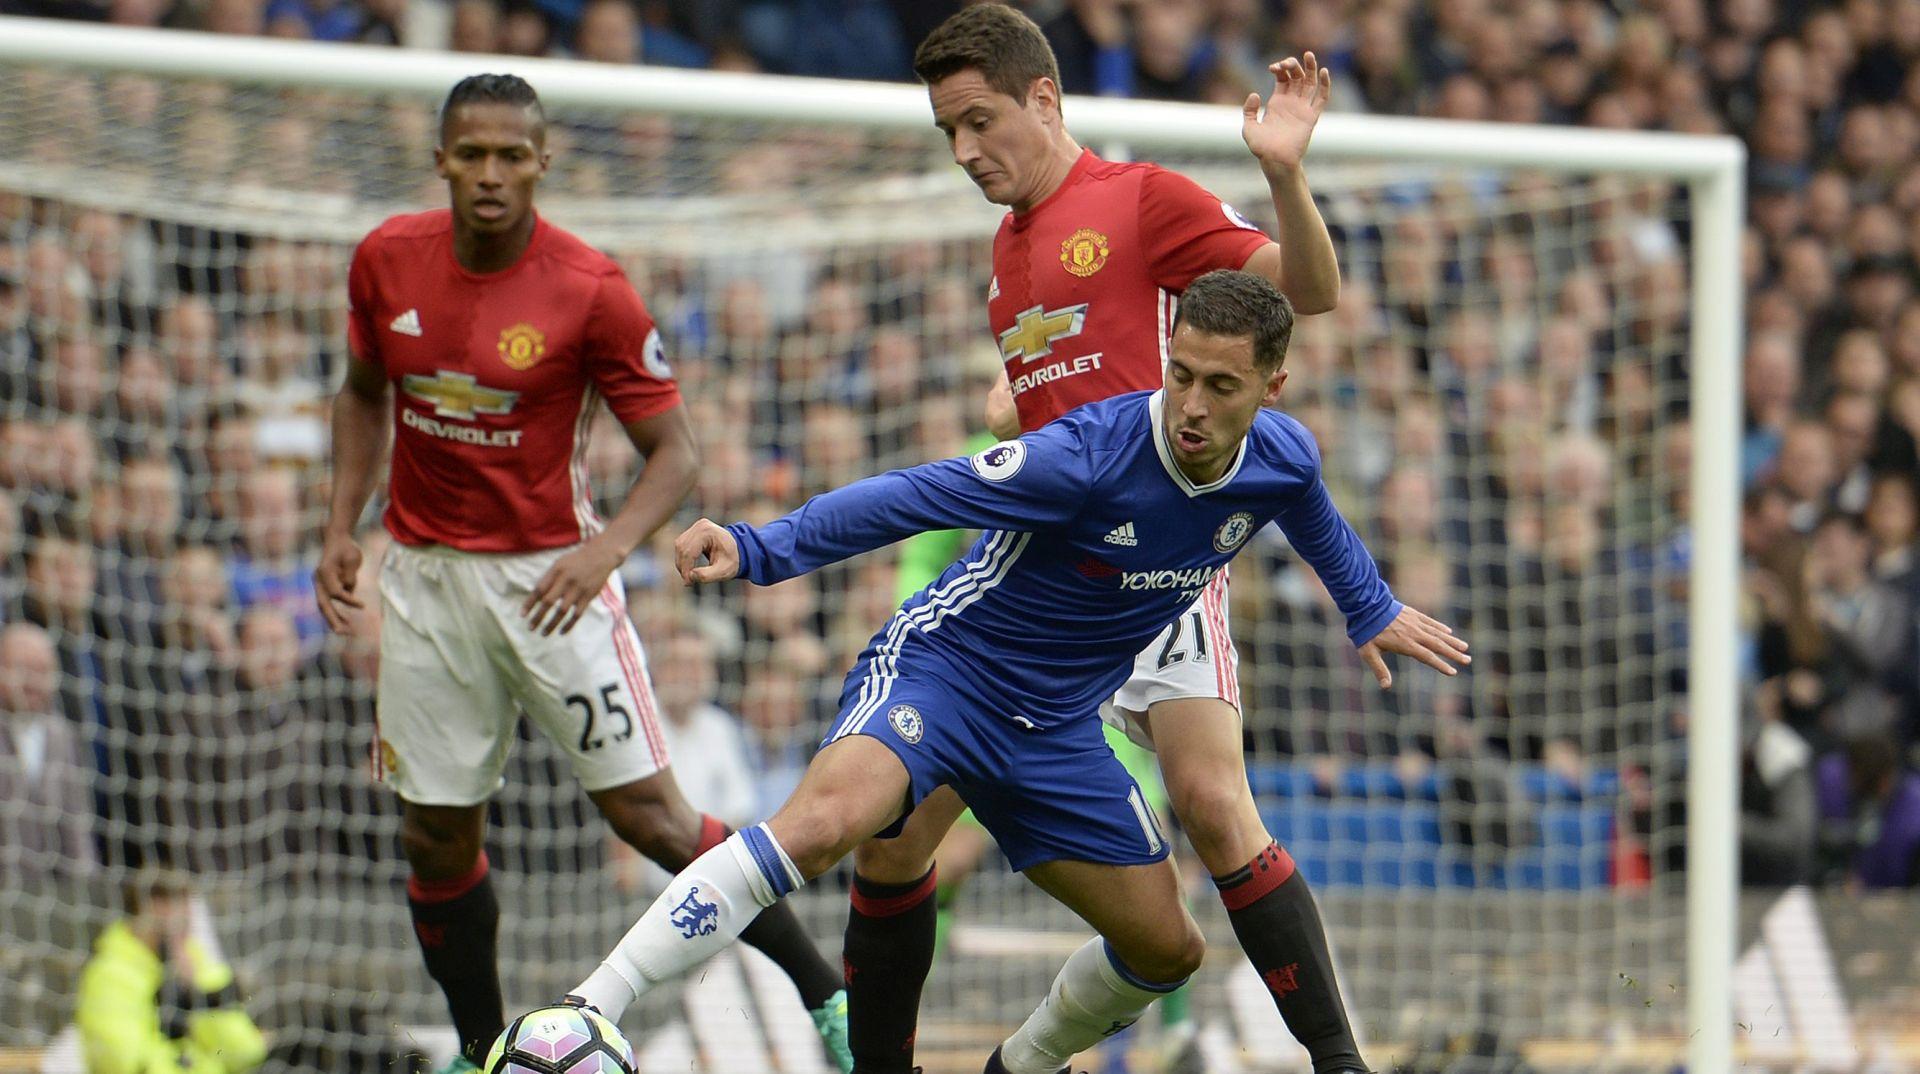 Manchester United pobijedio Chelsea 2-0